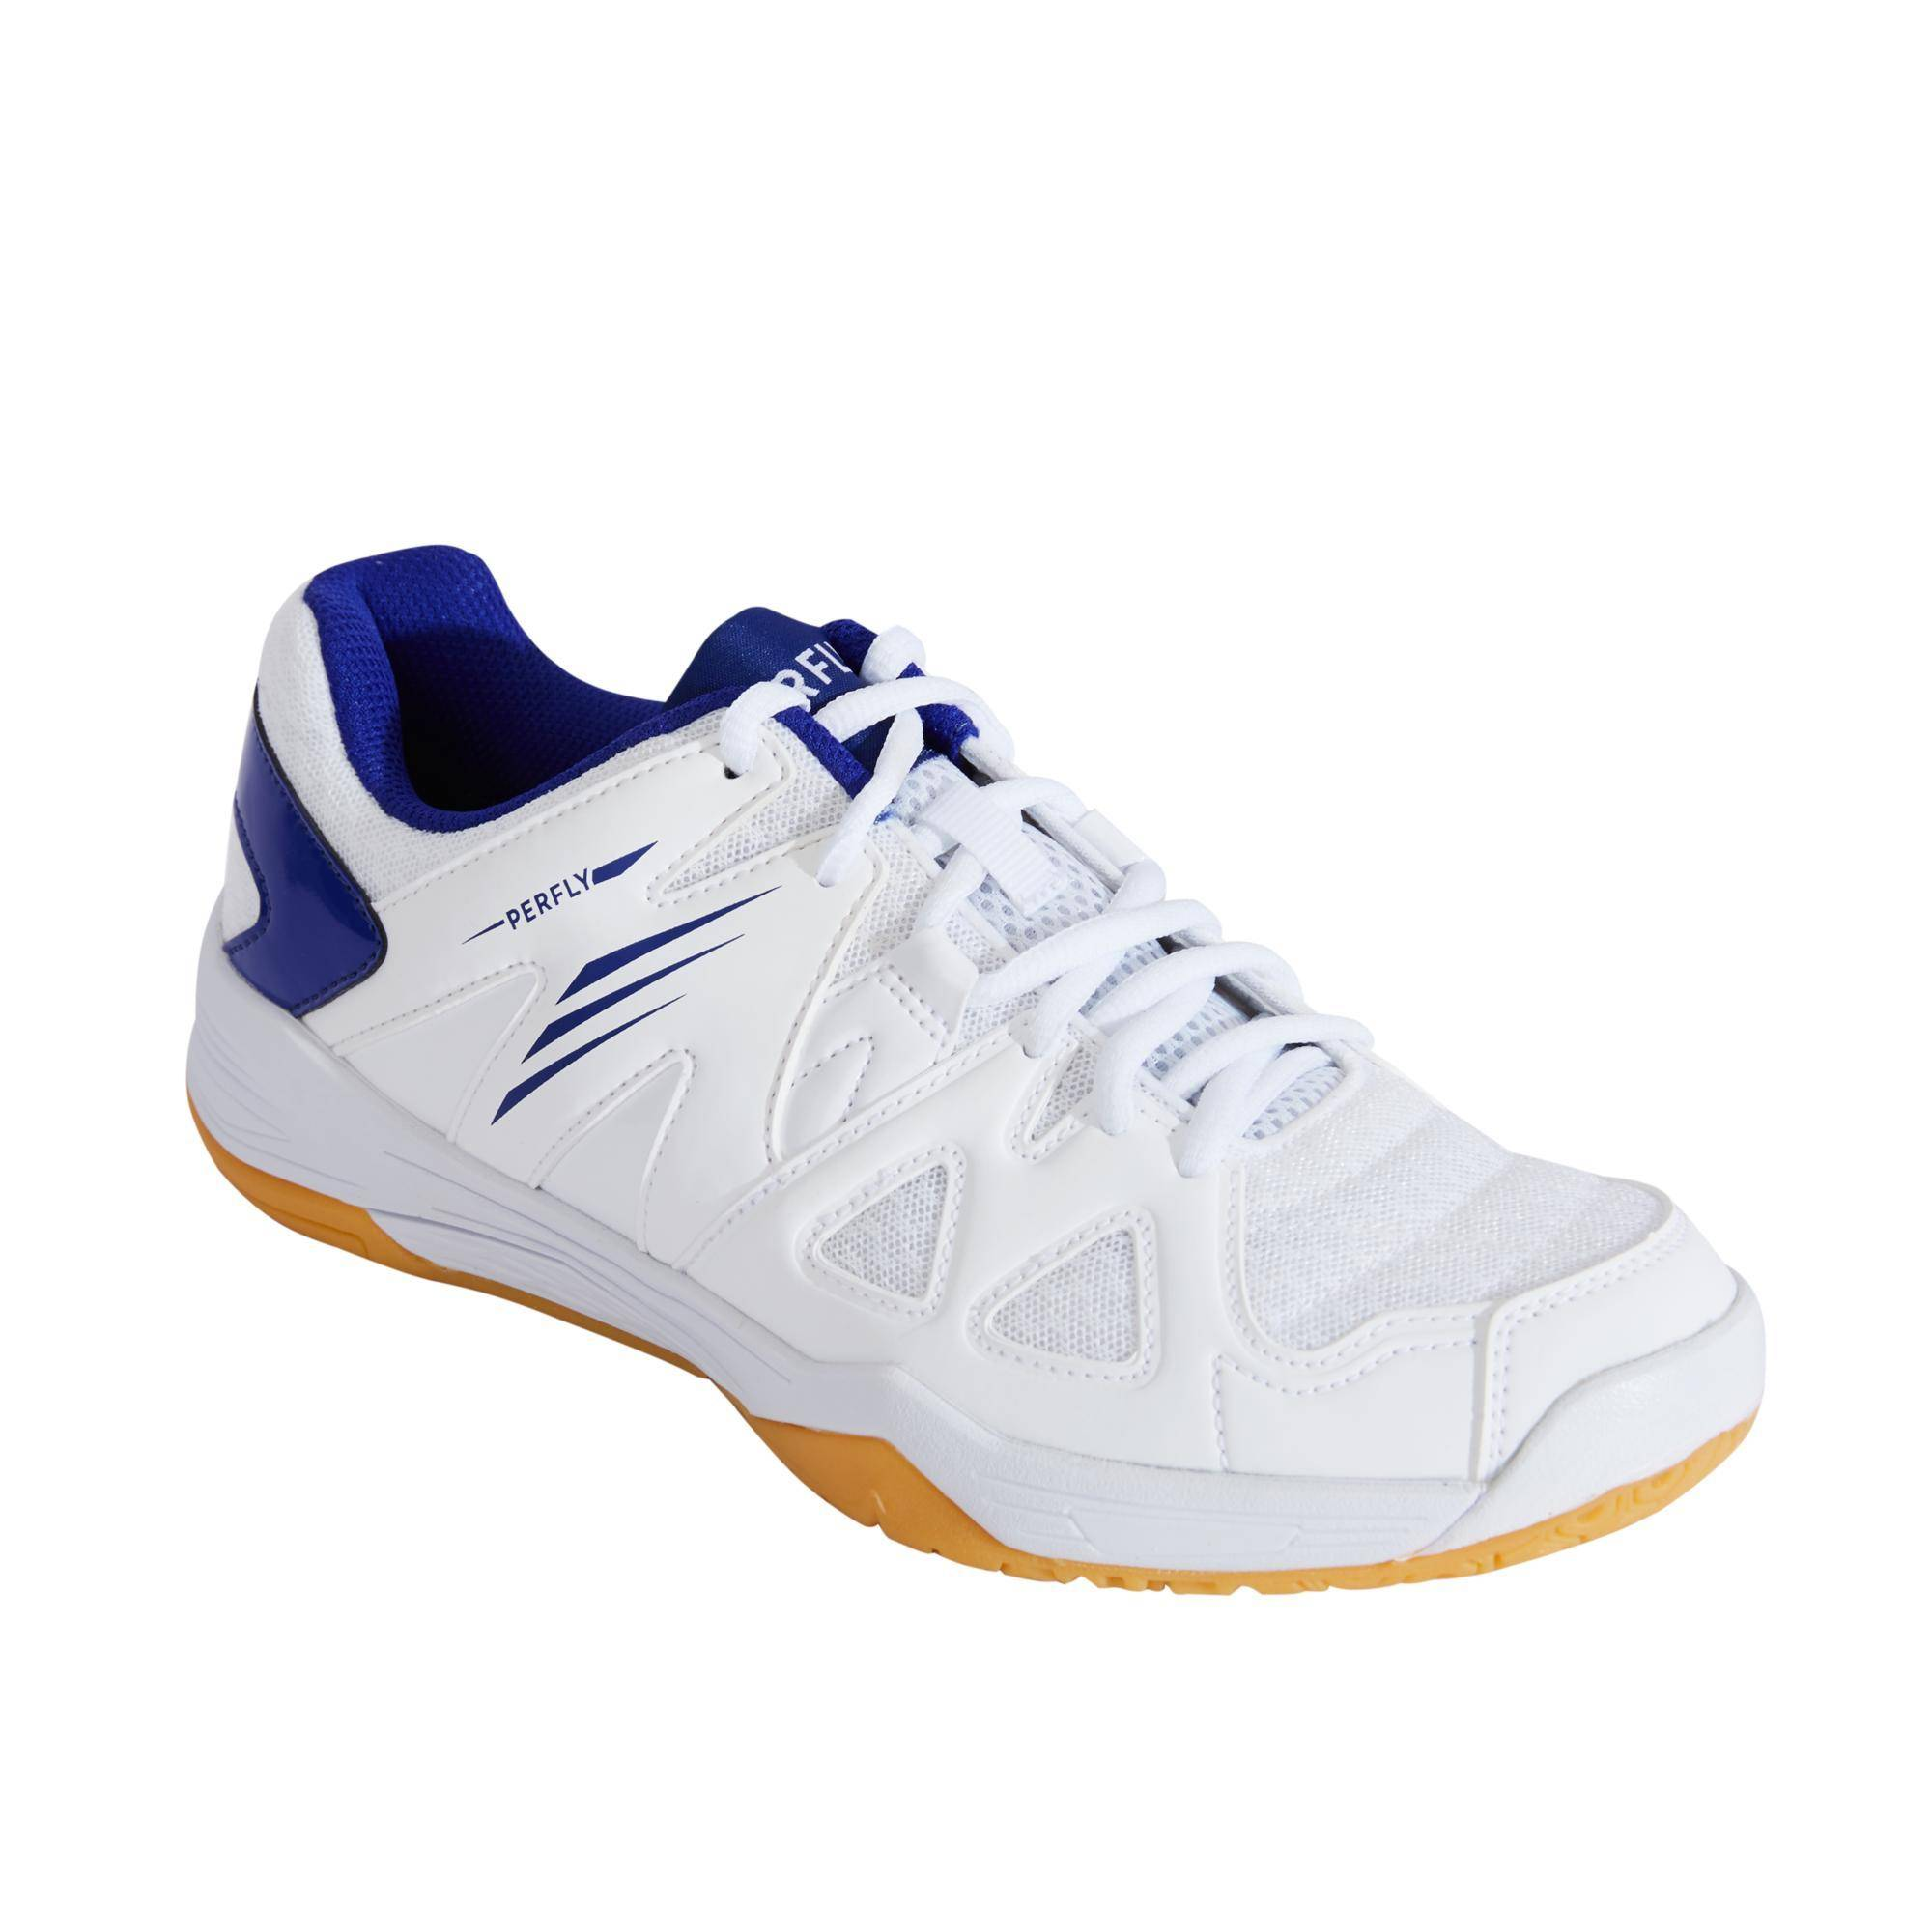 PERFLY Chaussures De Badminton Femme BS530 - Blanc/Bleu - PERFLY - 38